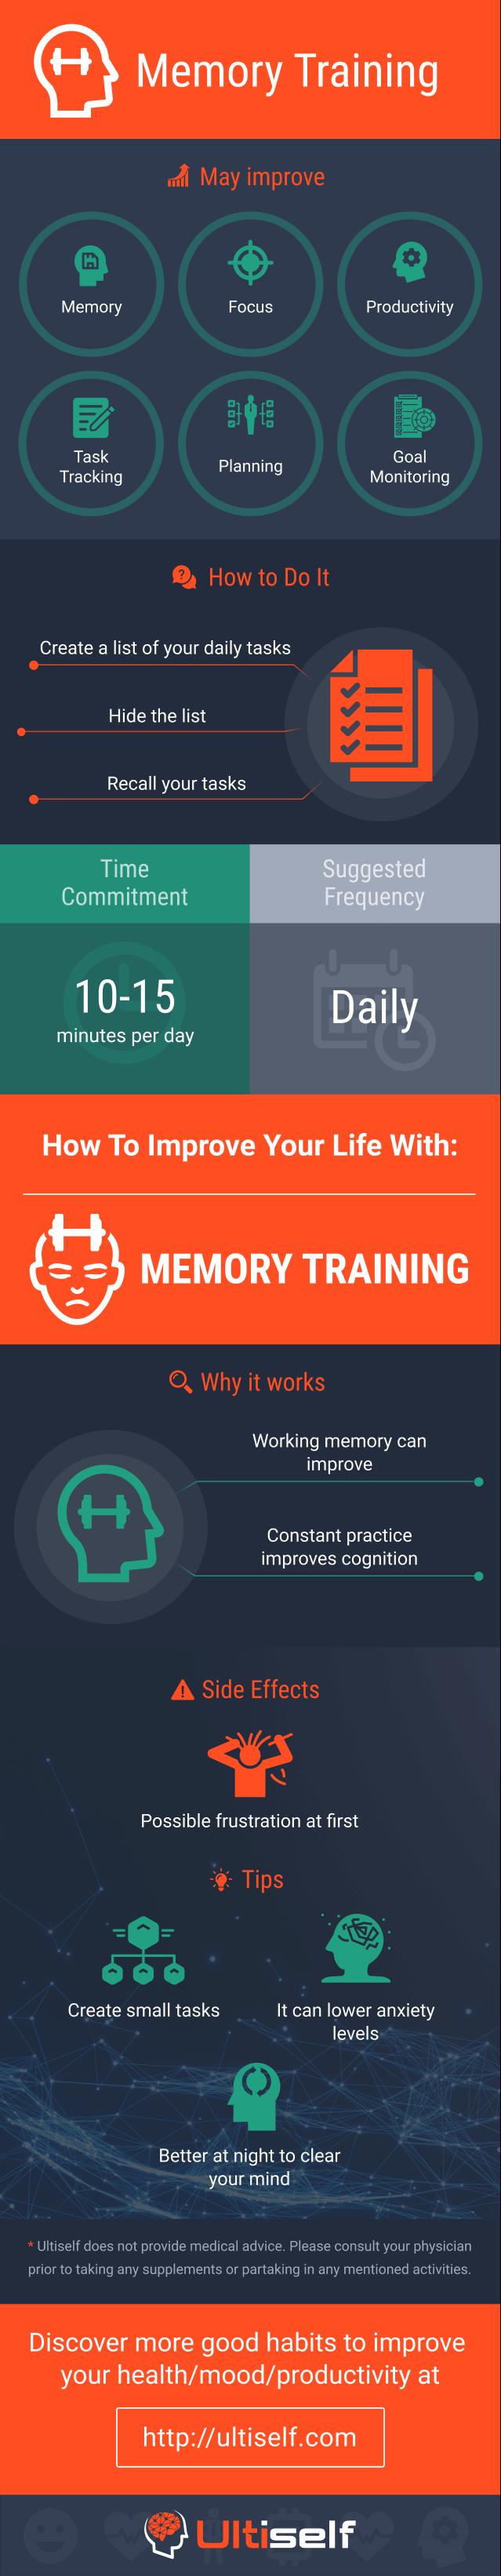 Memory Training infographic